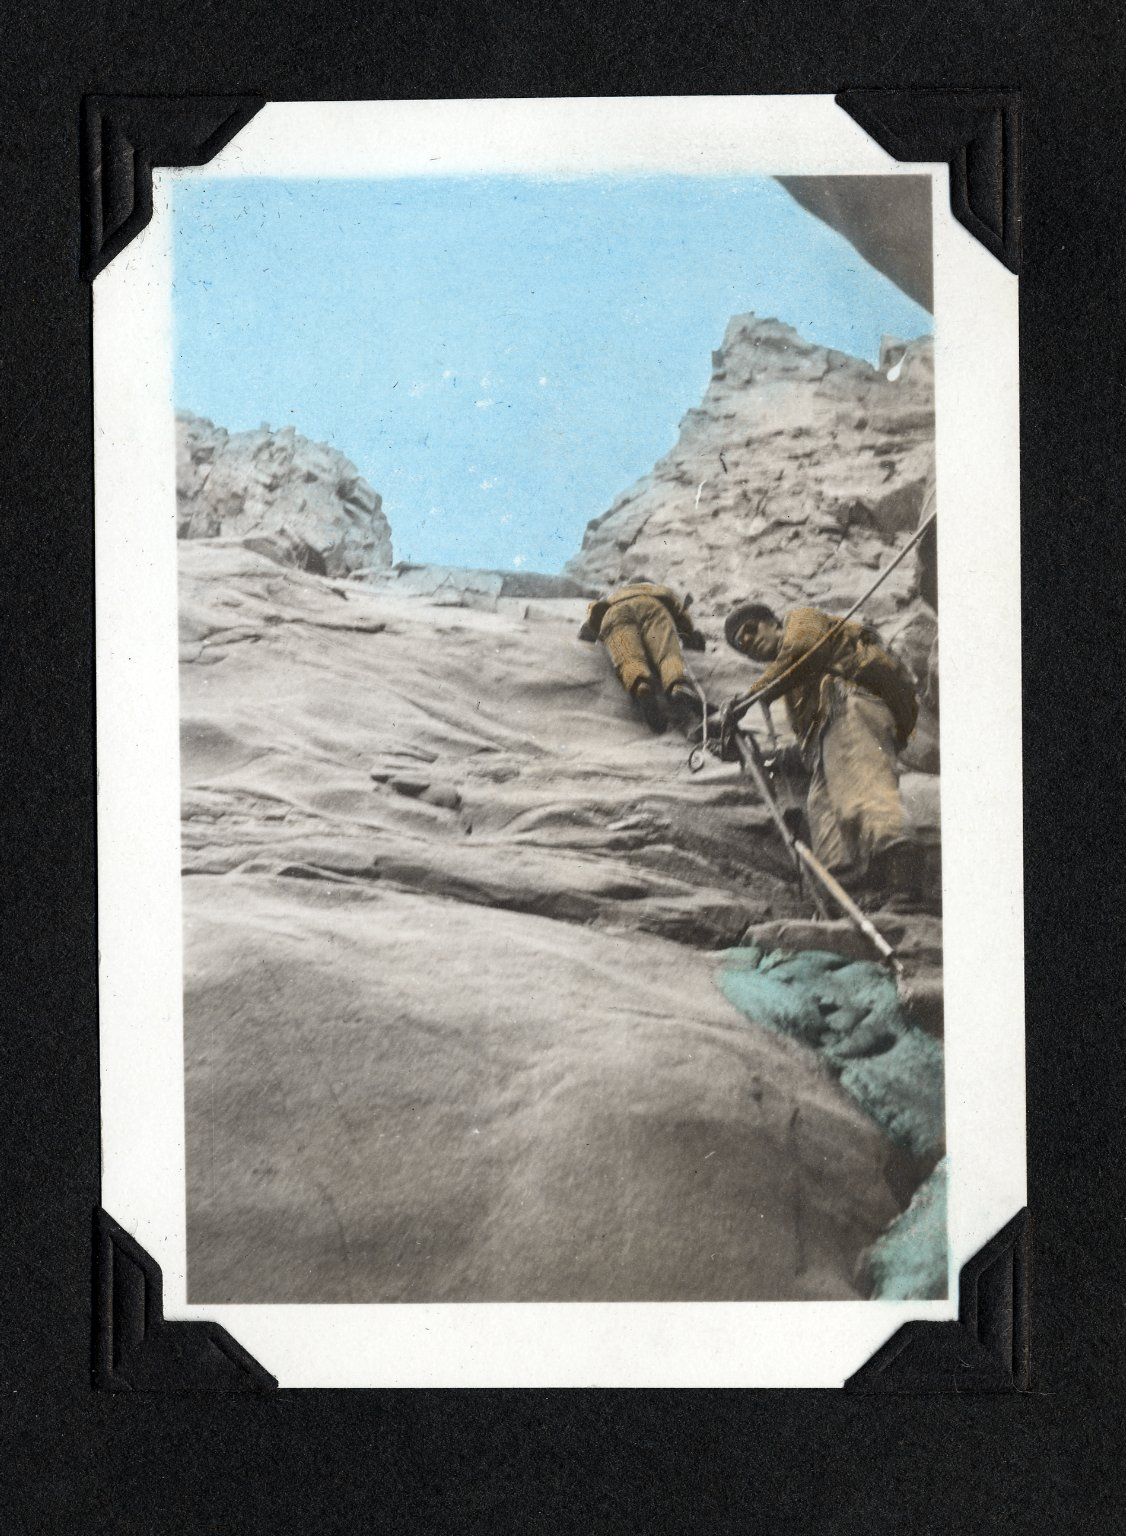 Steep rock climbing to gap